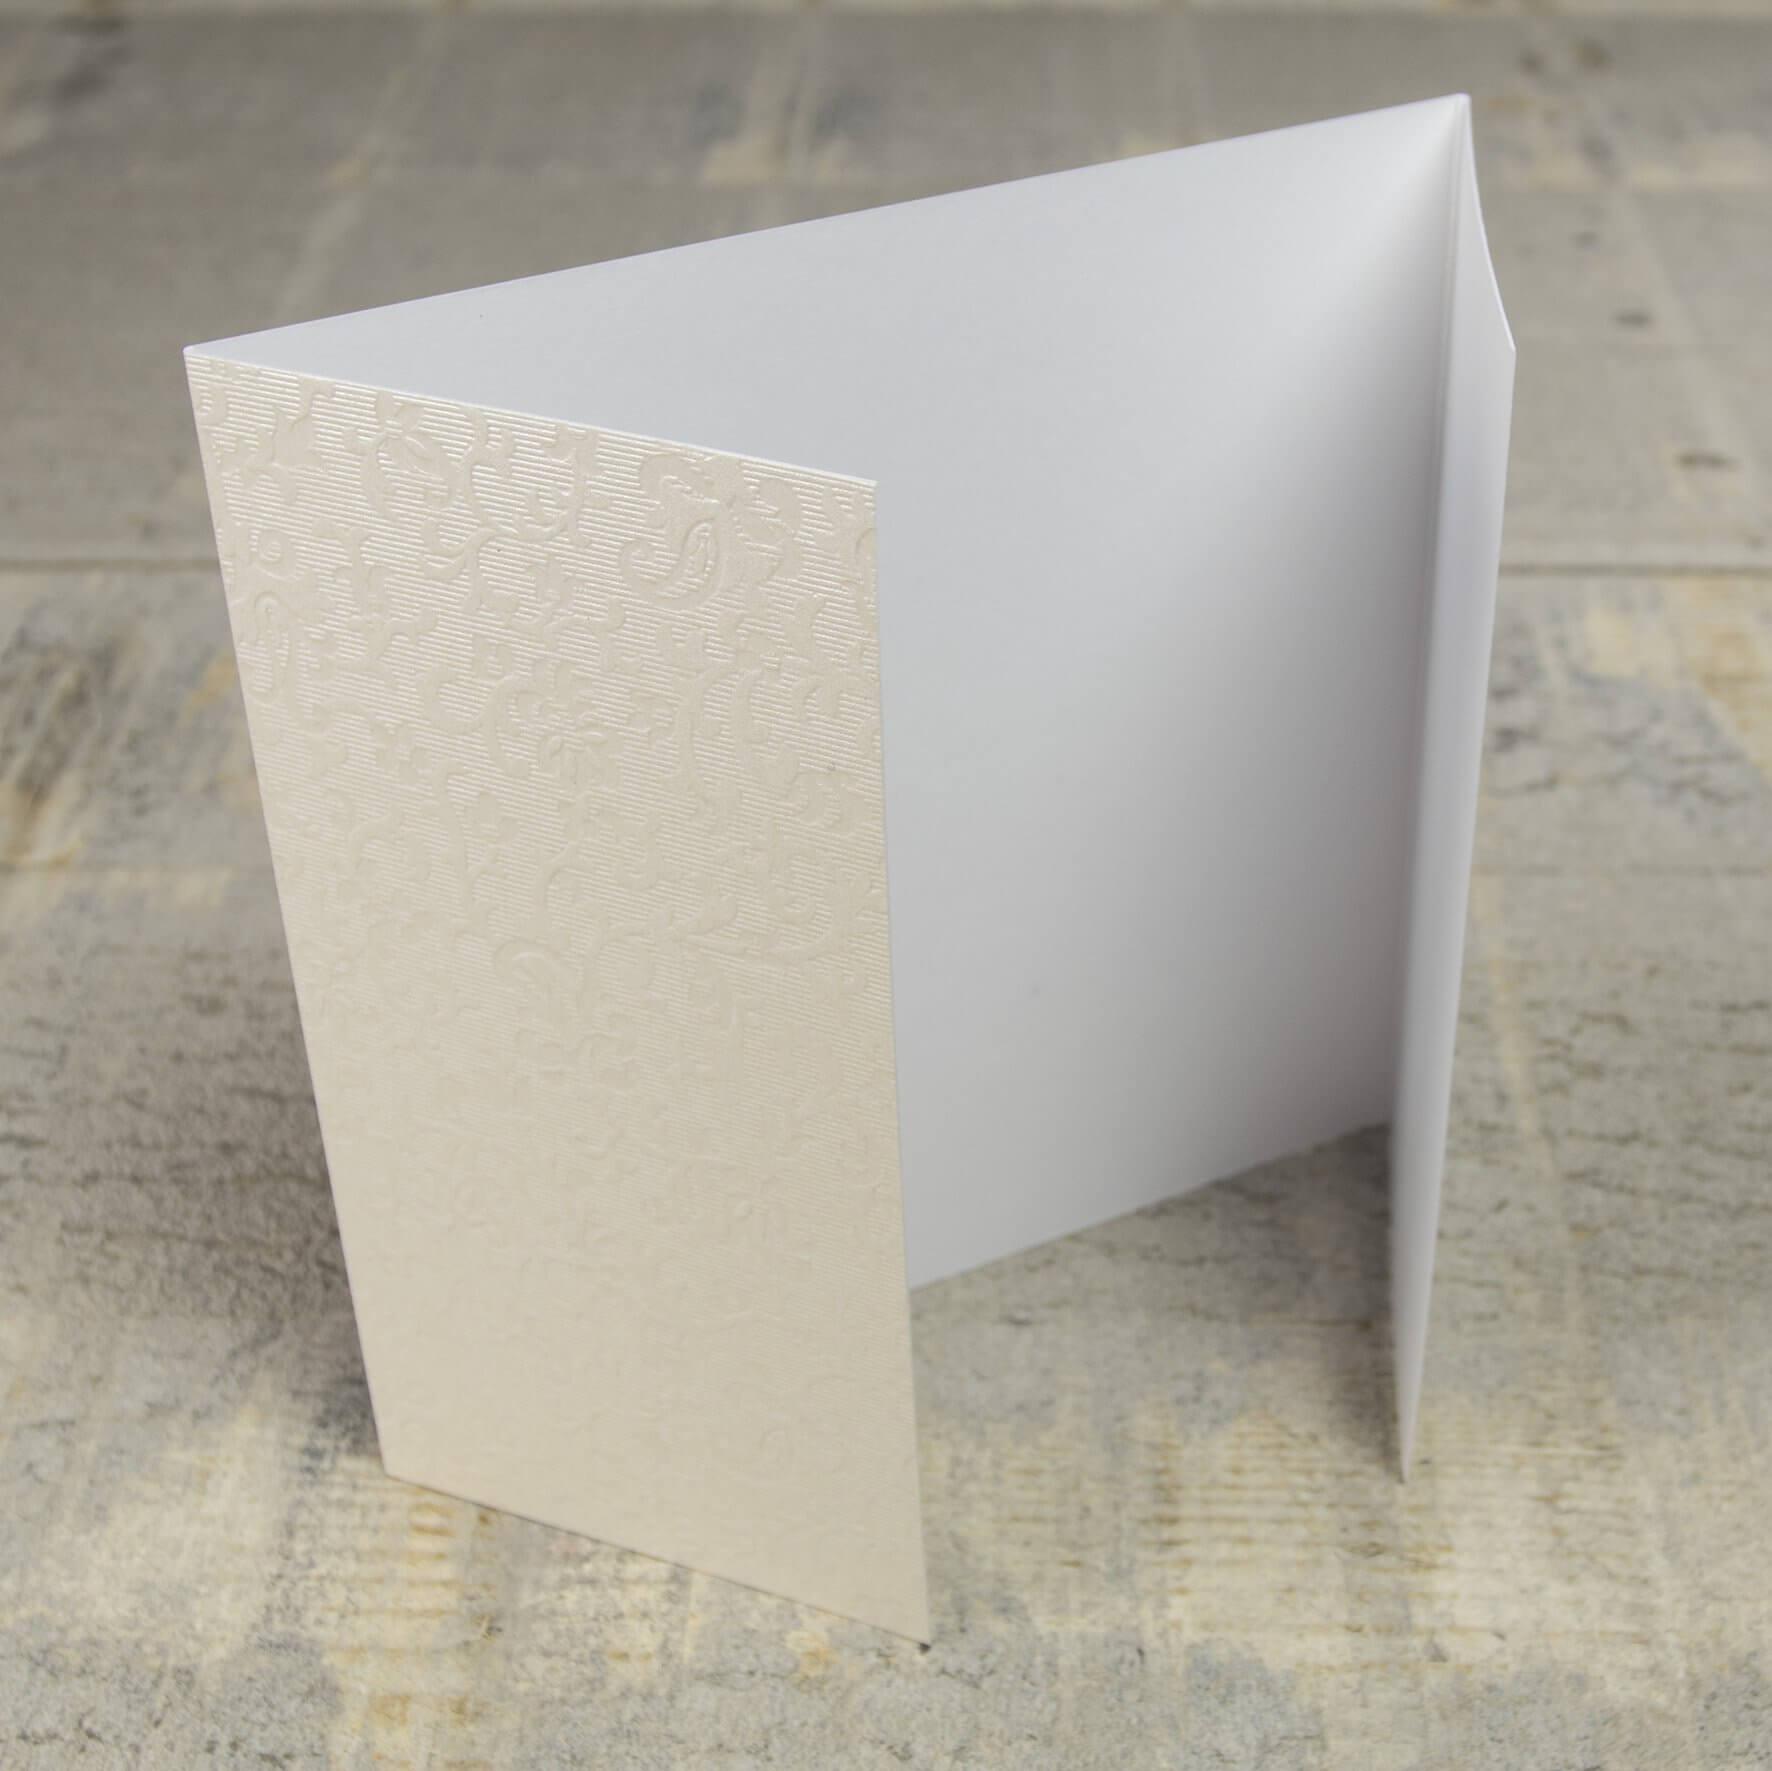 Creased Card Gatefold (Lg Sq) - Applique Ivory